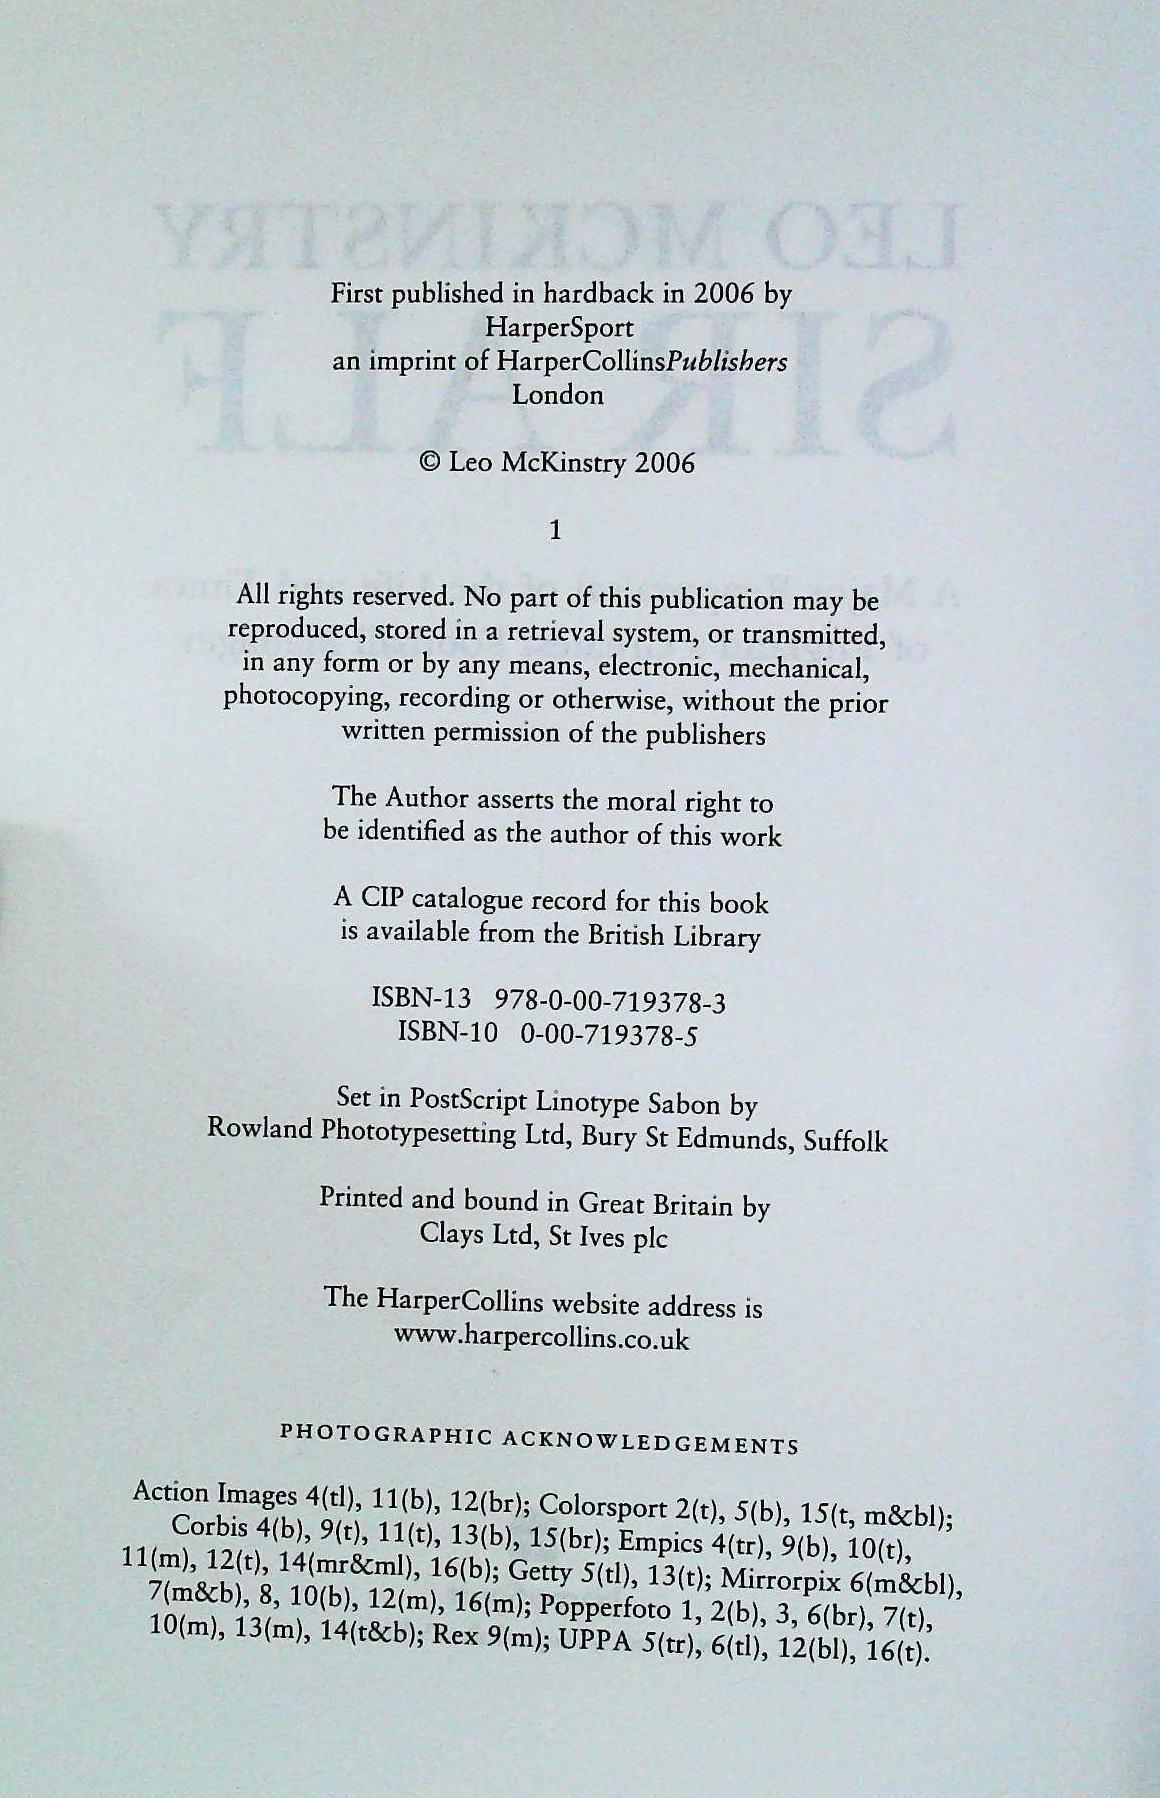 Sir Alf hardback book by Leo McKinstry. Published 2006 Harpersport. ISBN 0-00-719378-5. 528 pages. - Image 3 of 3